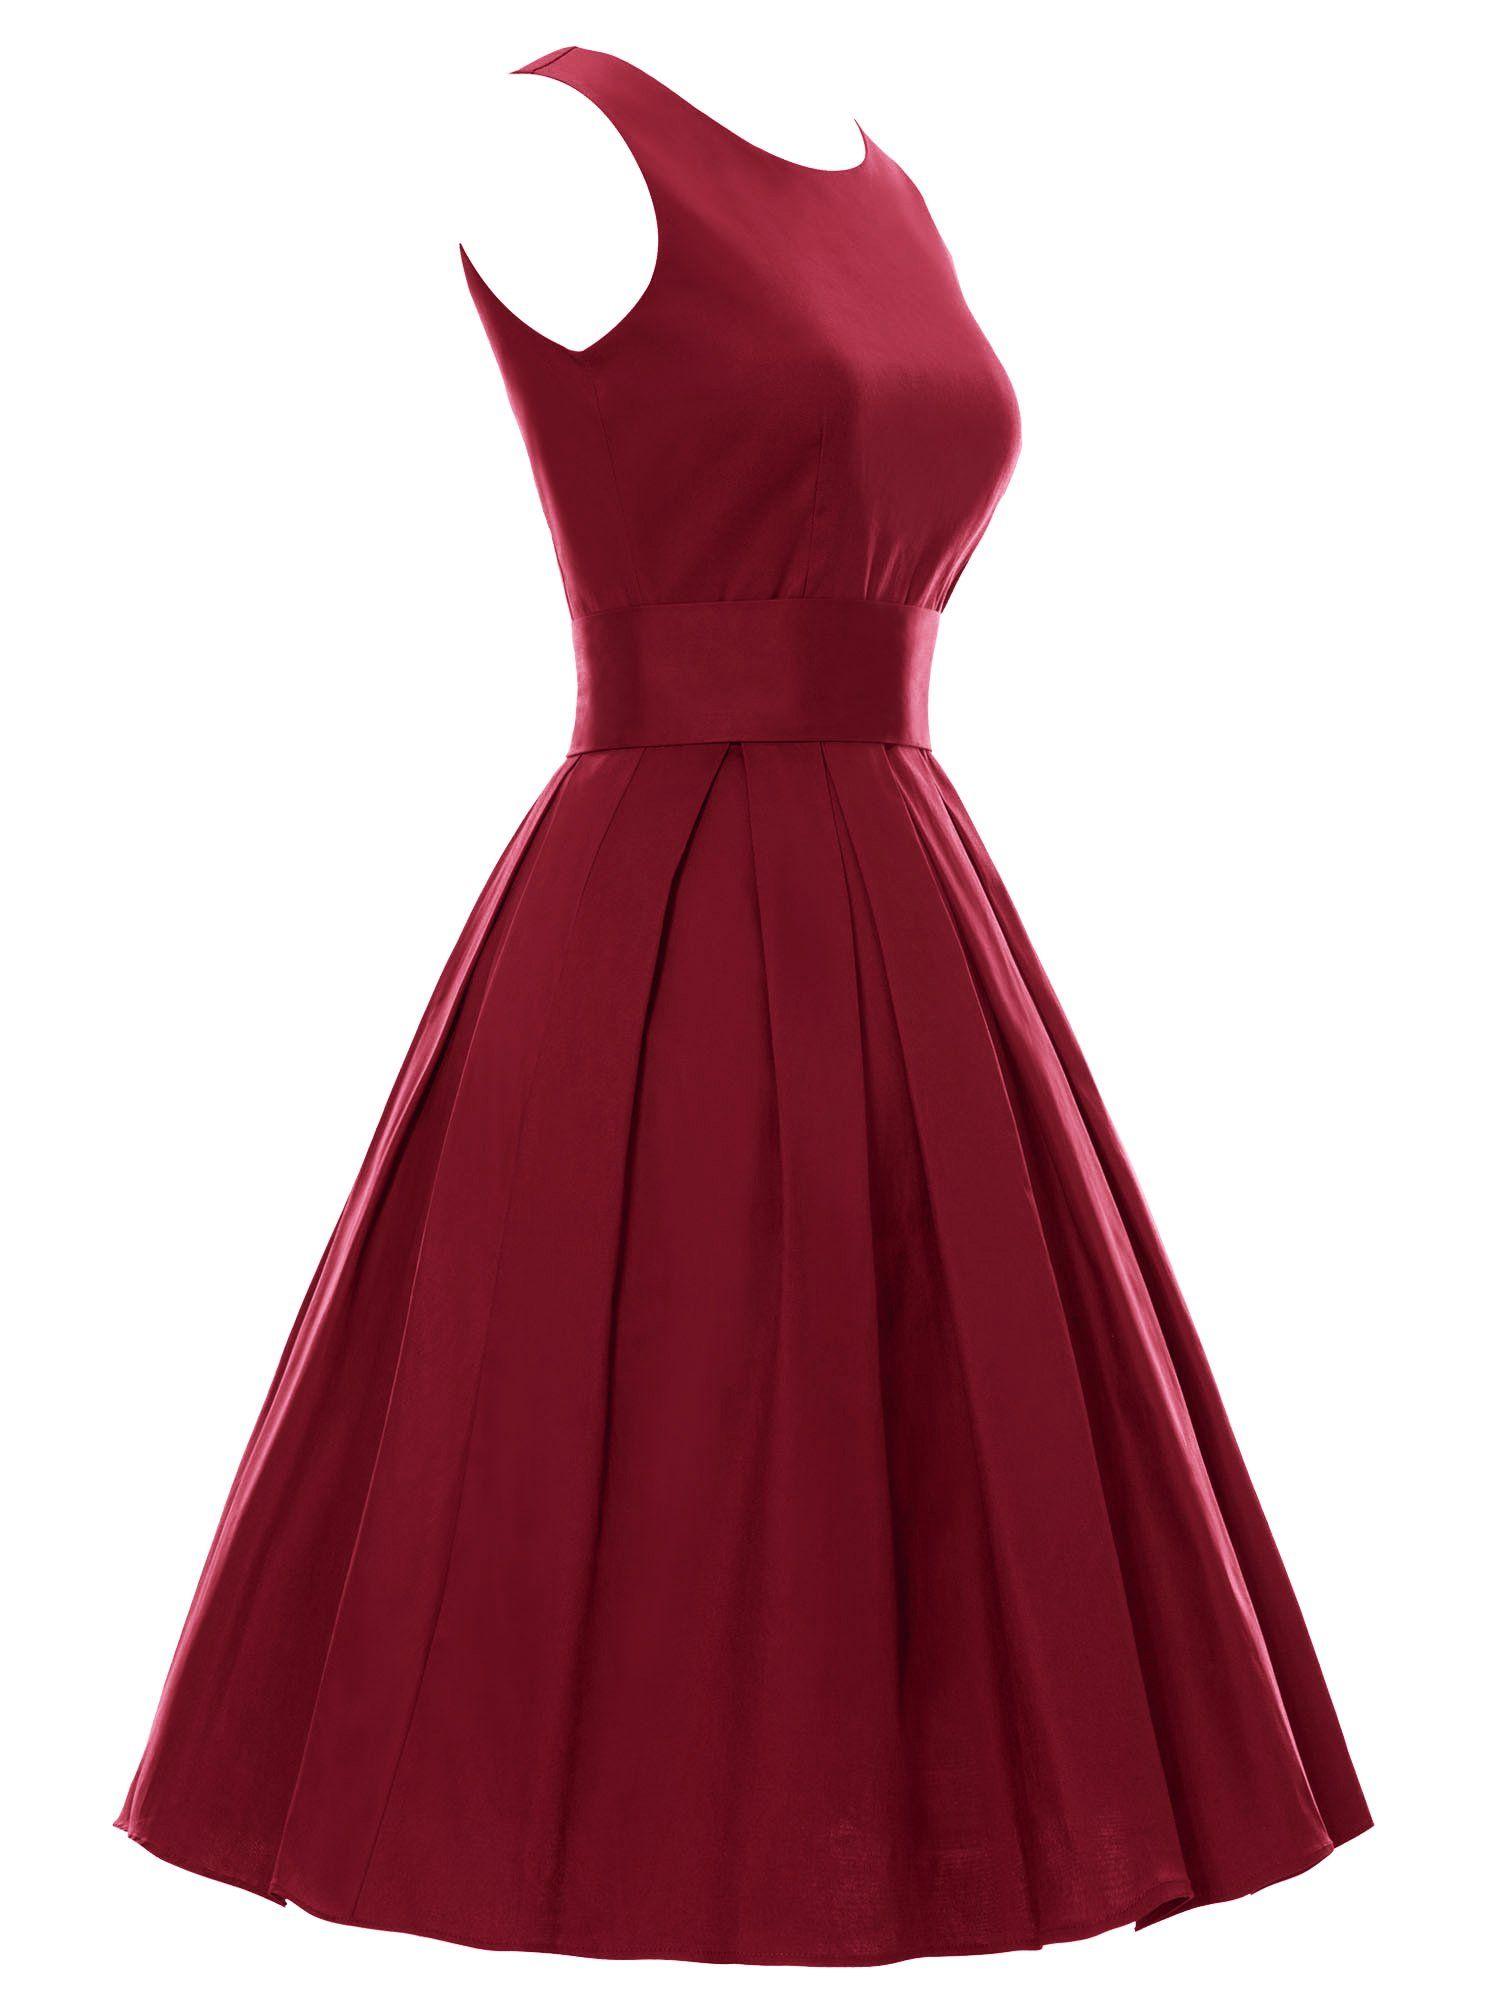 luouse sommer damen ohne arm kleid dress vintage petticoat